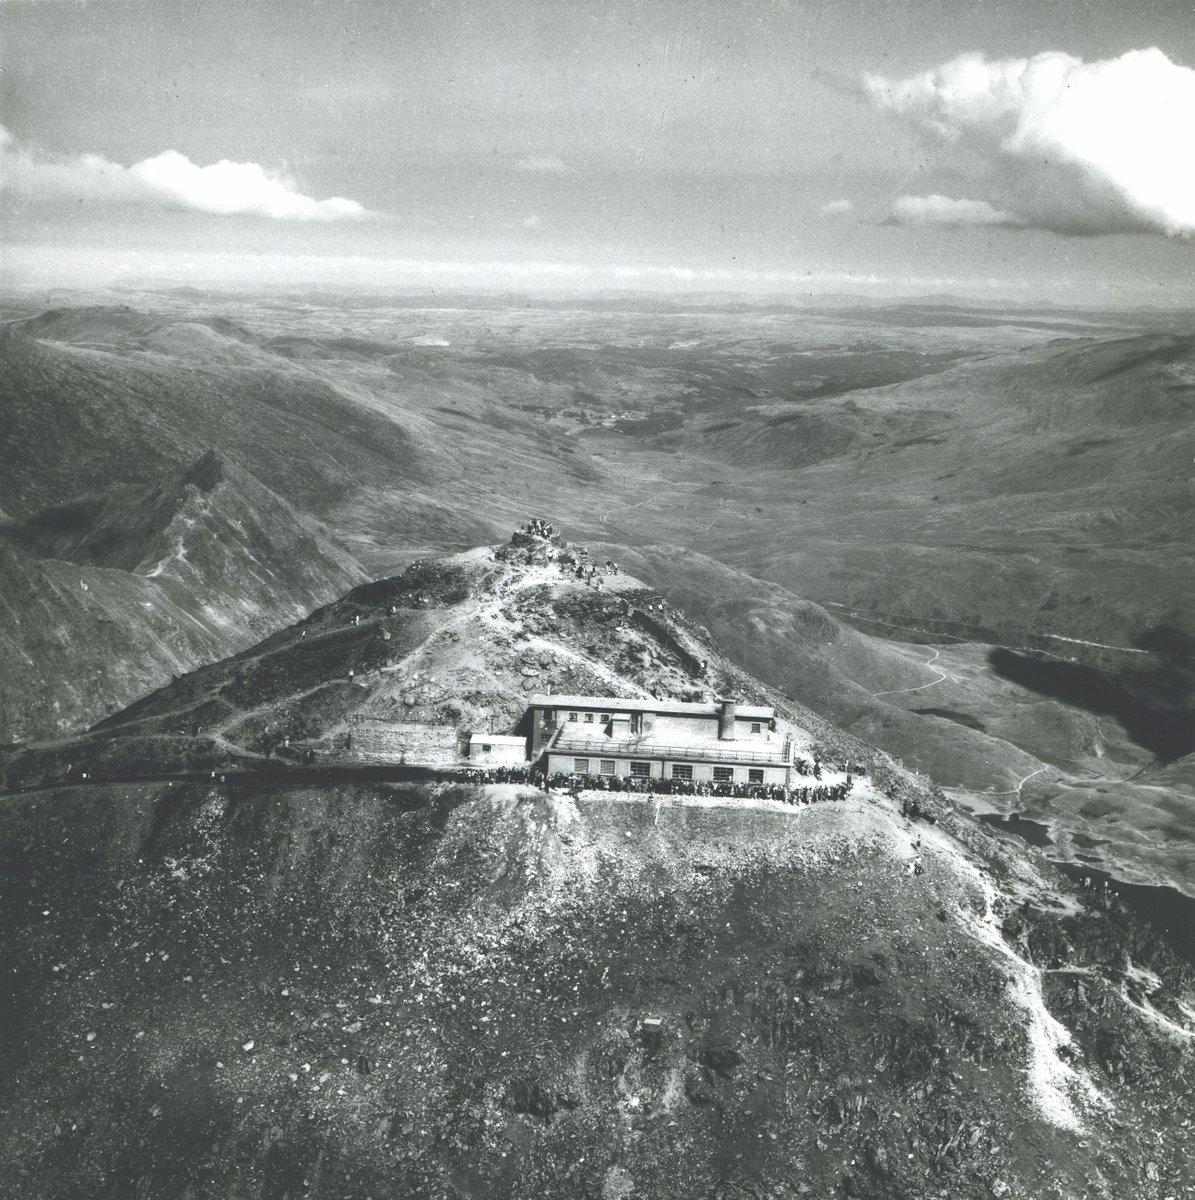 Dq6JglsWwAA9ElU - Snowdon's Hafod Eryri 10 years